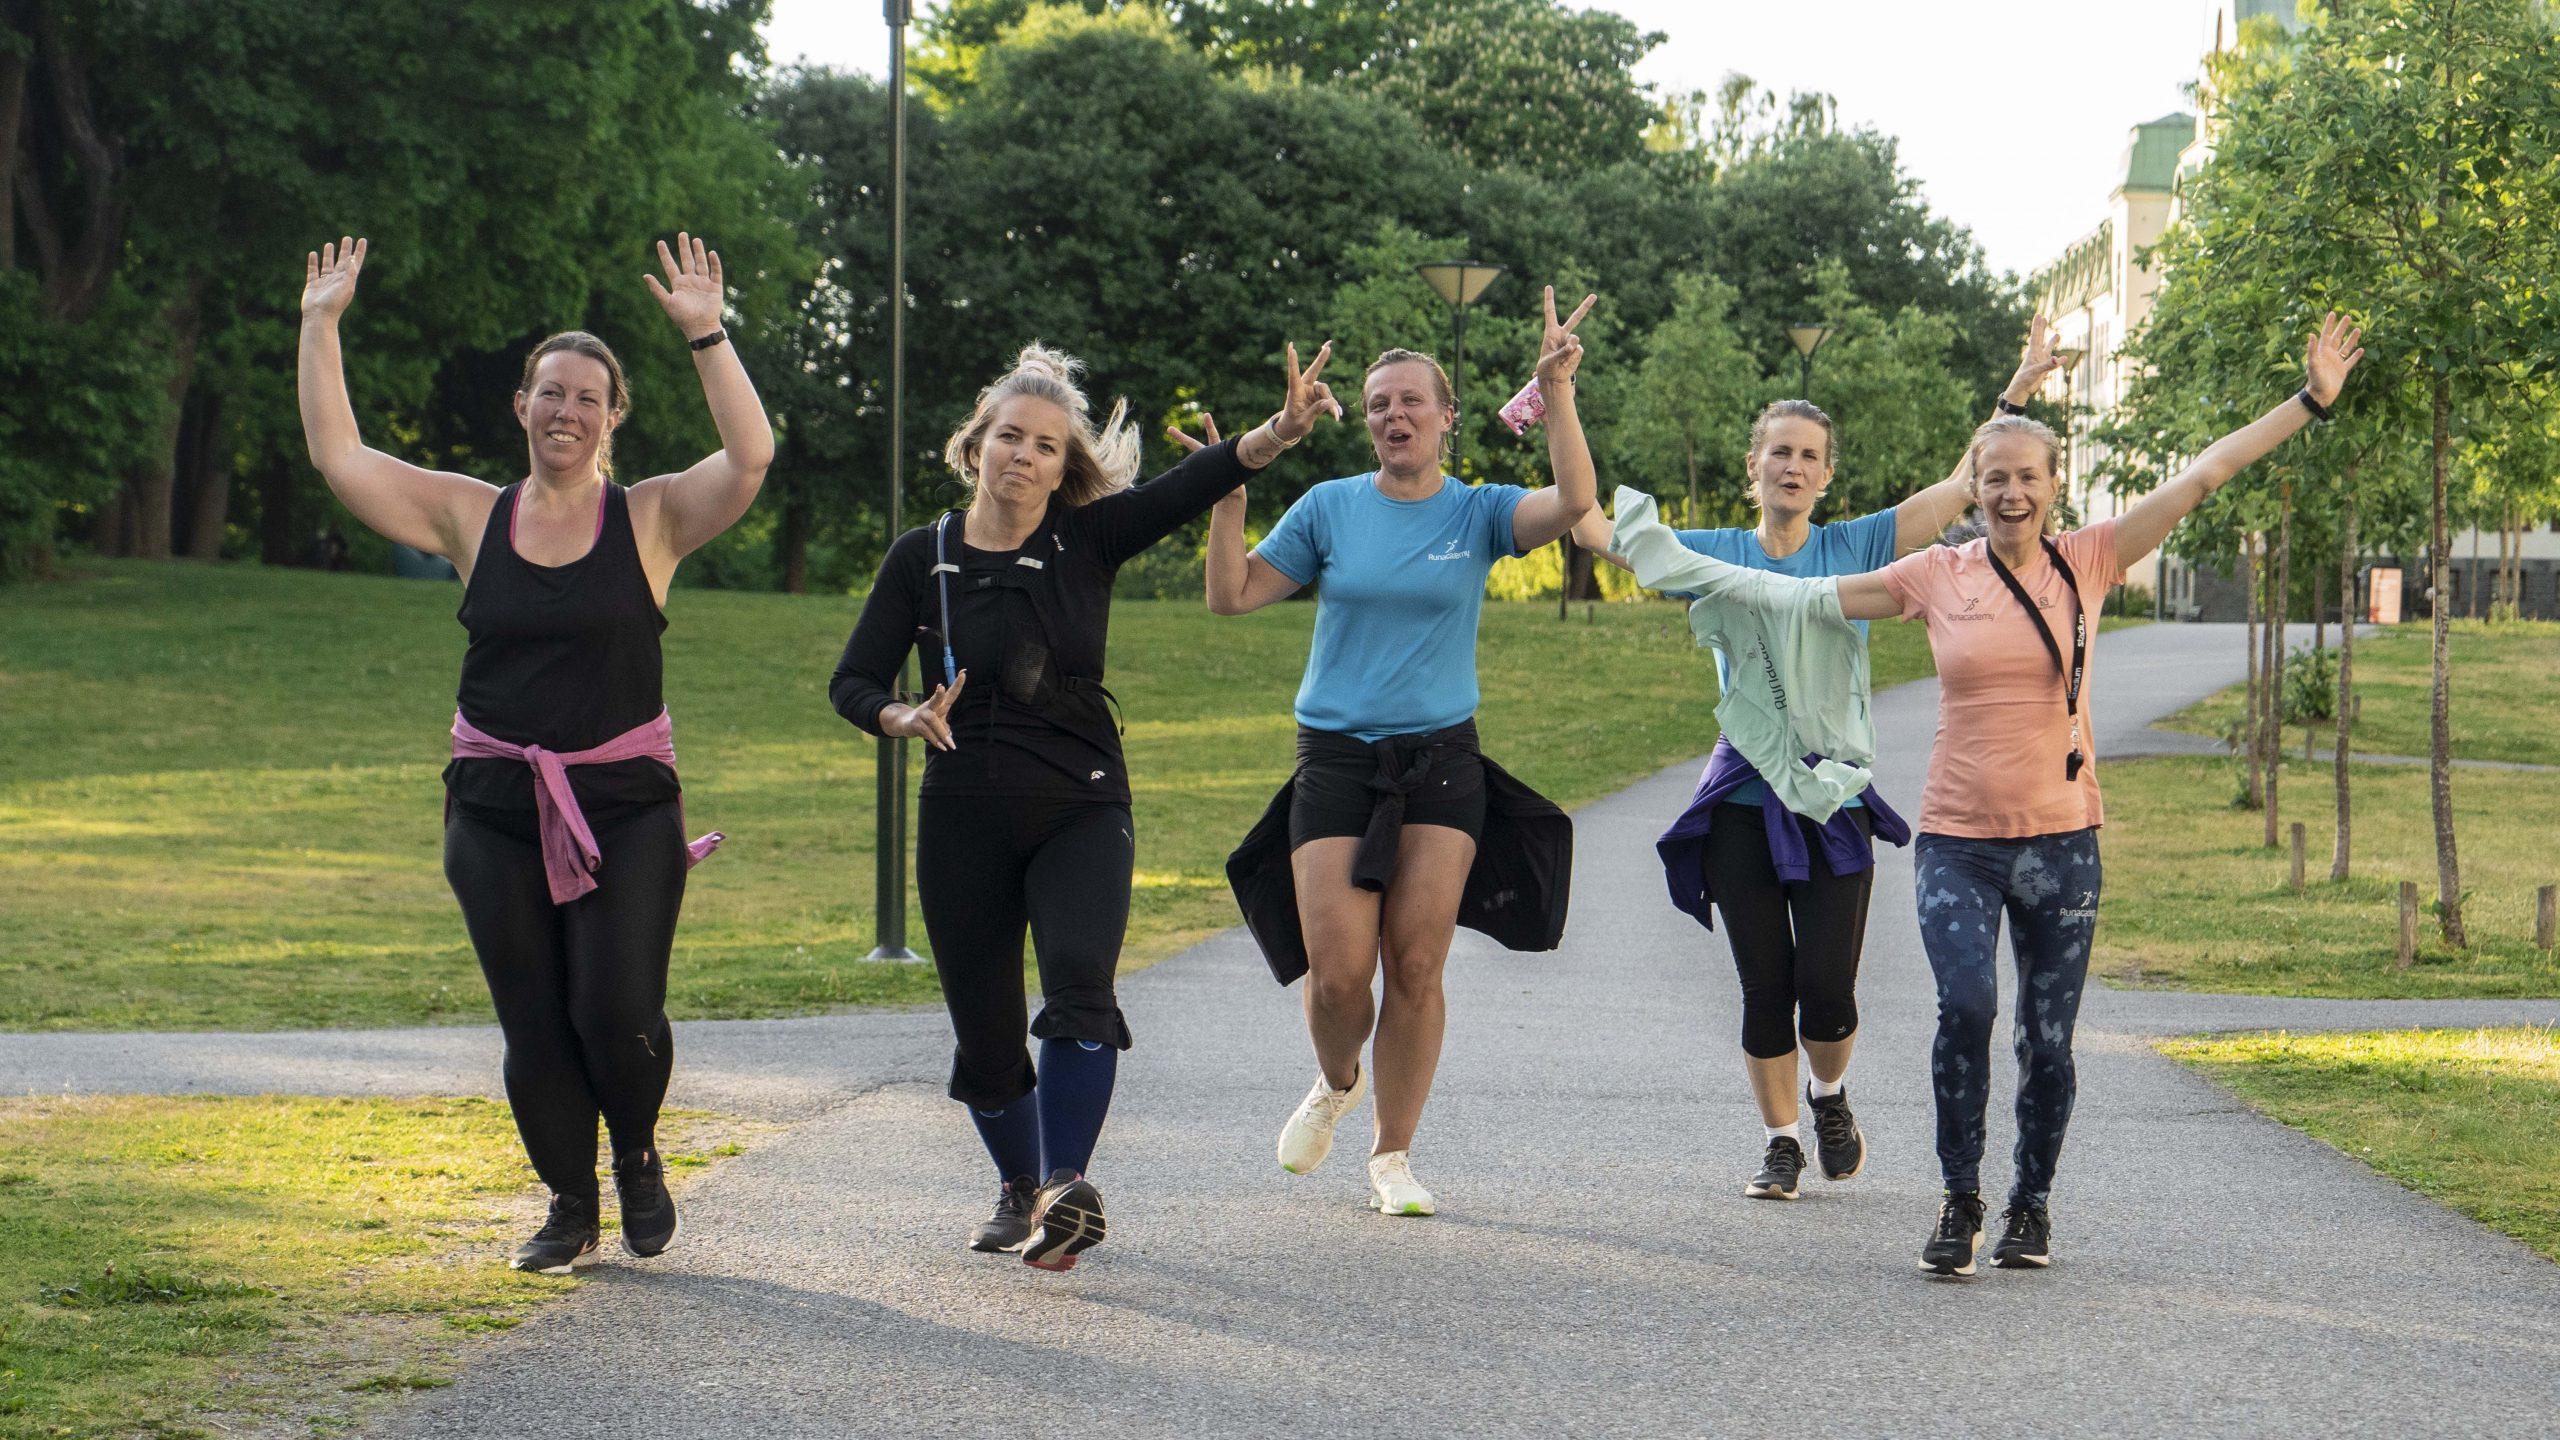 Glad löpare springer i grupp